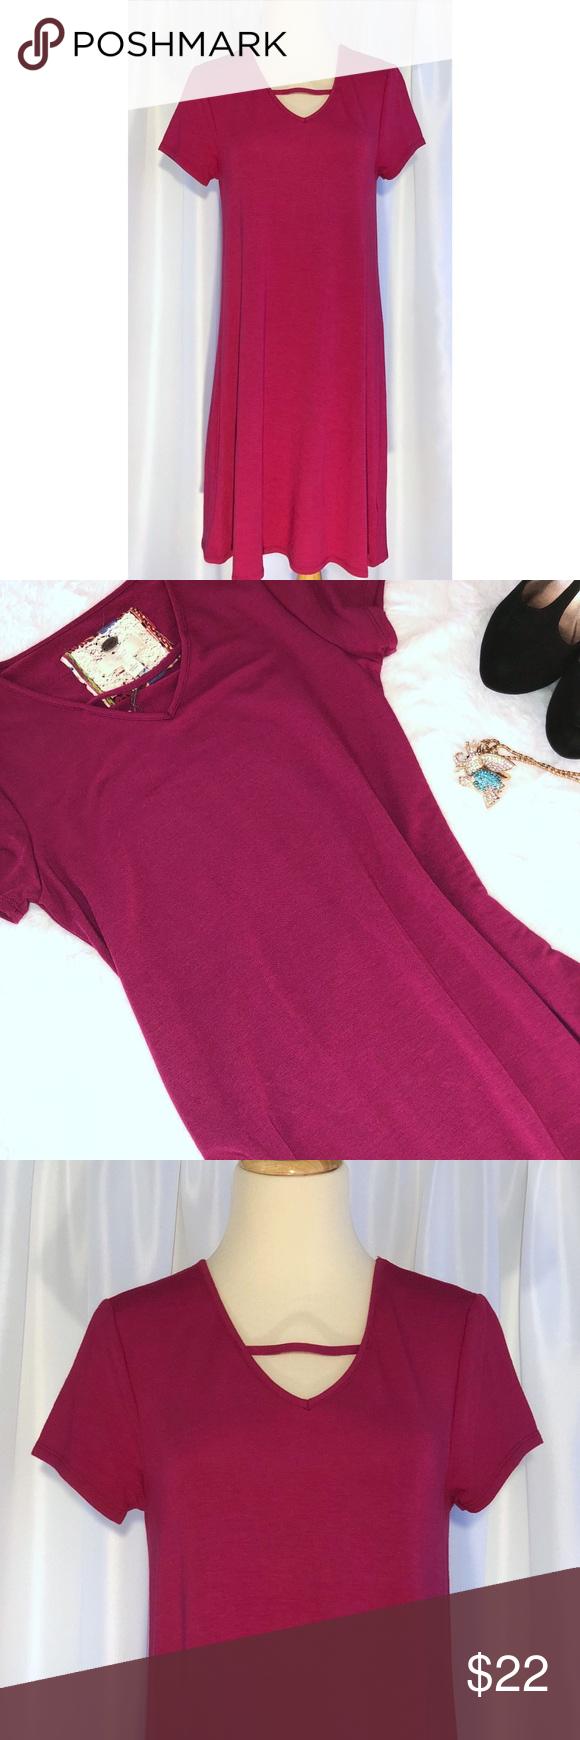 92dfd089de 💲🔟SALE NWT Magenta Swing T-shirt Cutout Dress NWT Cupio Cutout Swing T